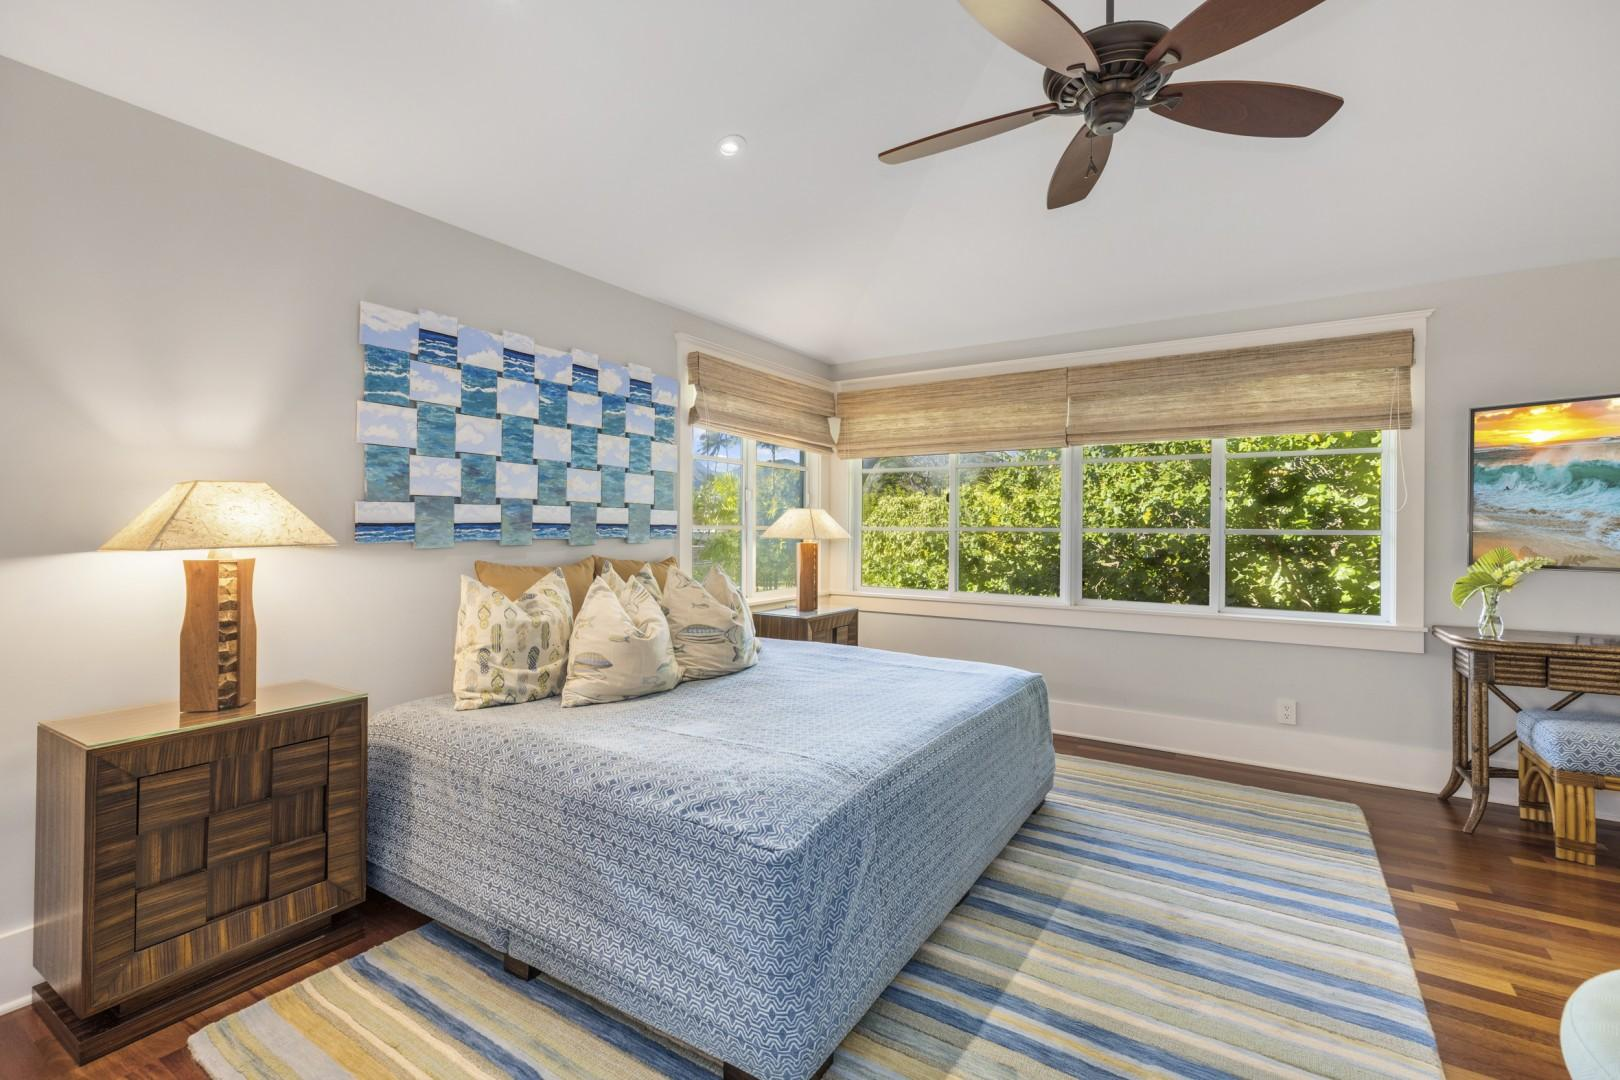 Second upstairs guest bedroom - Honu Suite